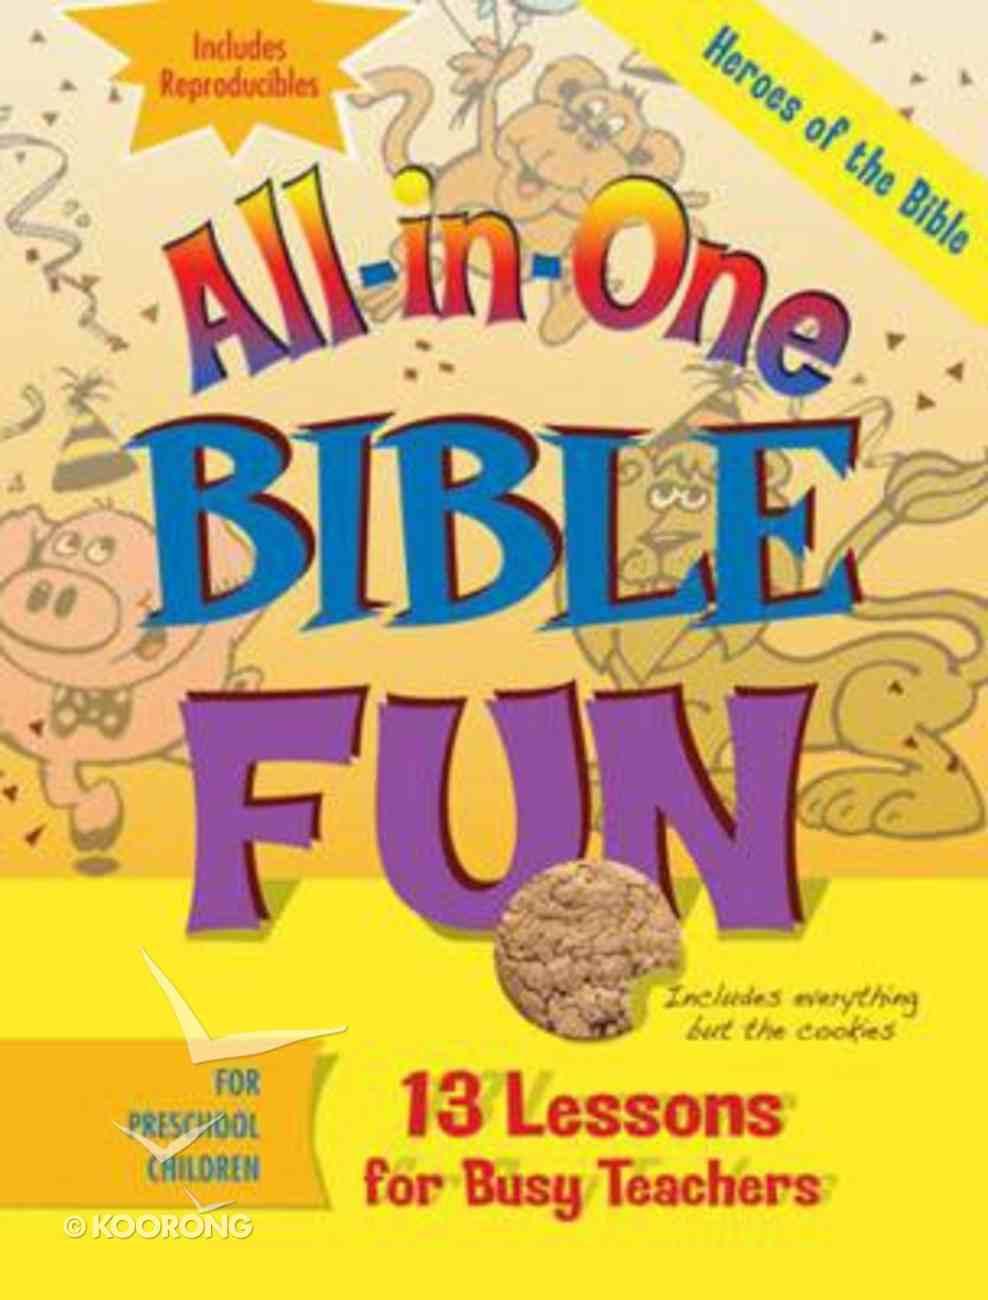 Heroes of the Bible - Preschool (Bible Fun) (All In One Bible Fun Series) Paperback